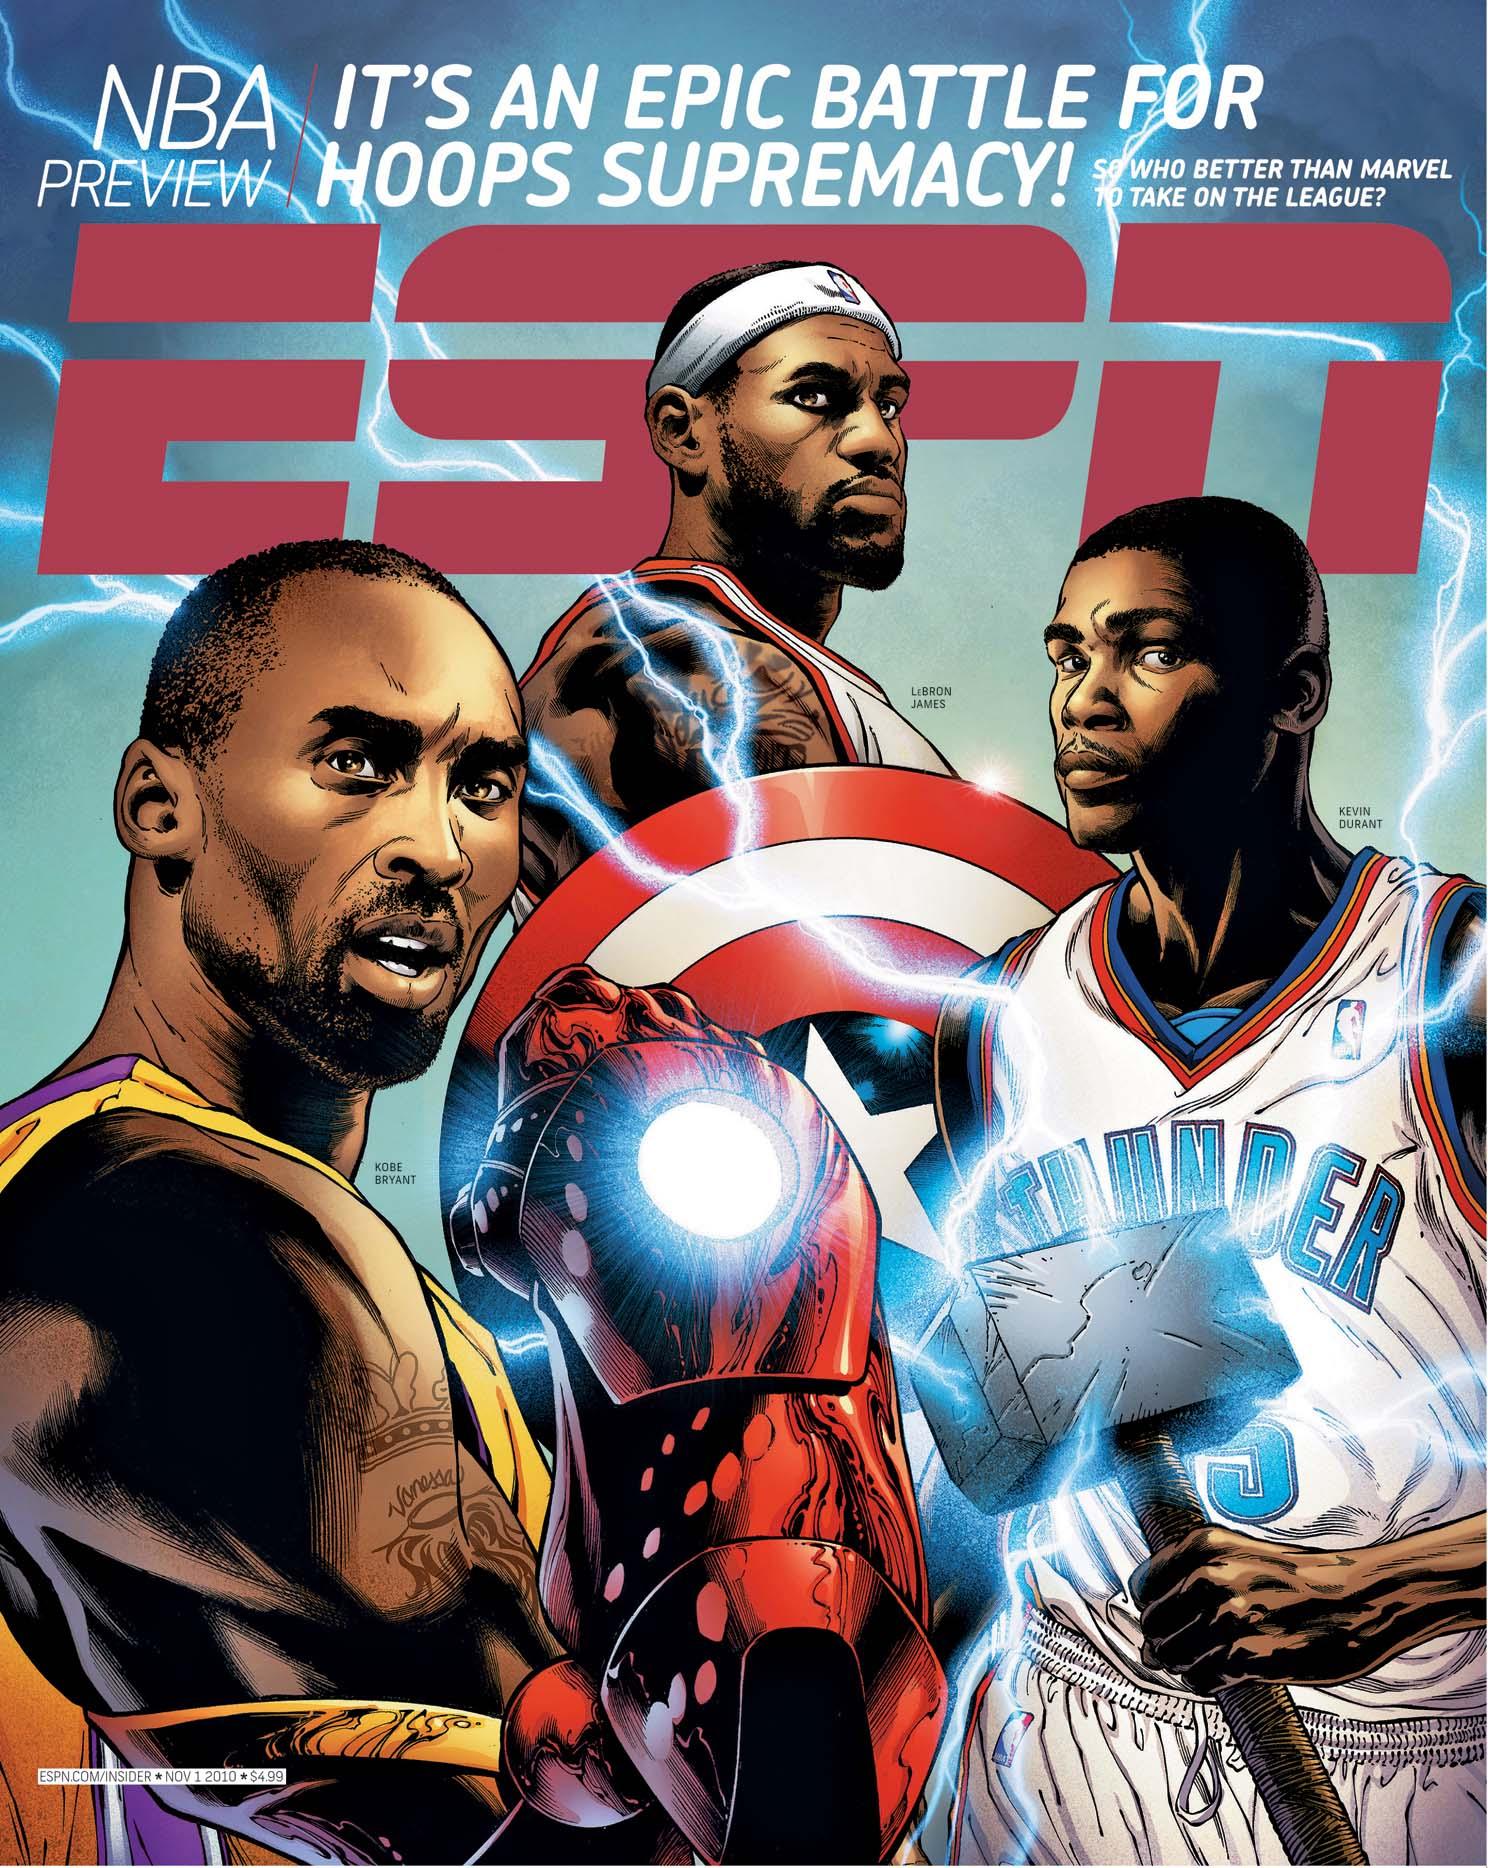 Kobe bryant lebron james kevin durant become marvel superheroes